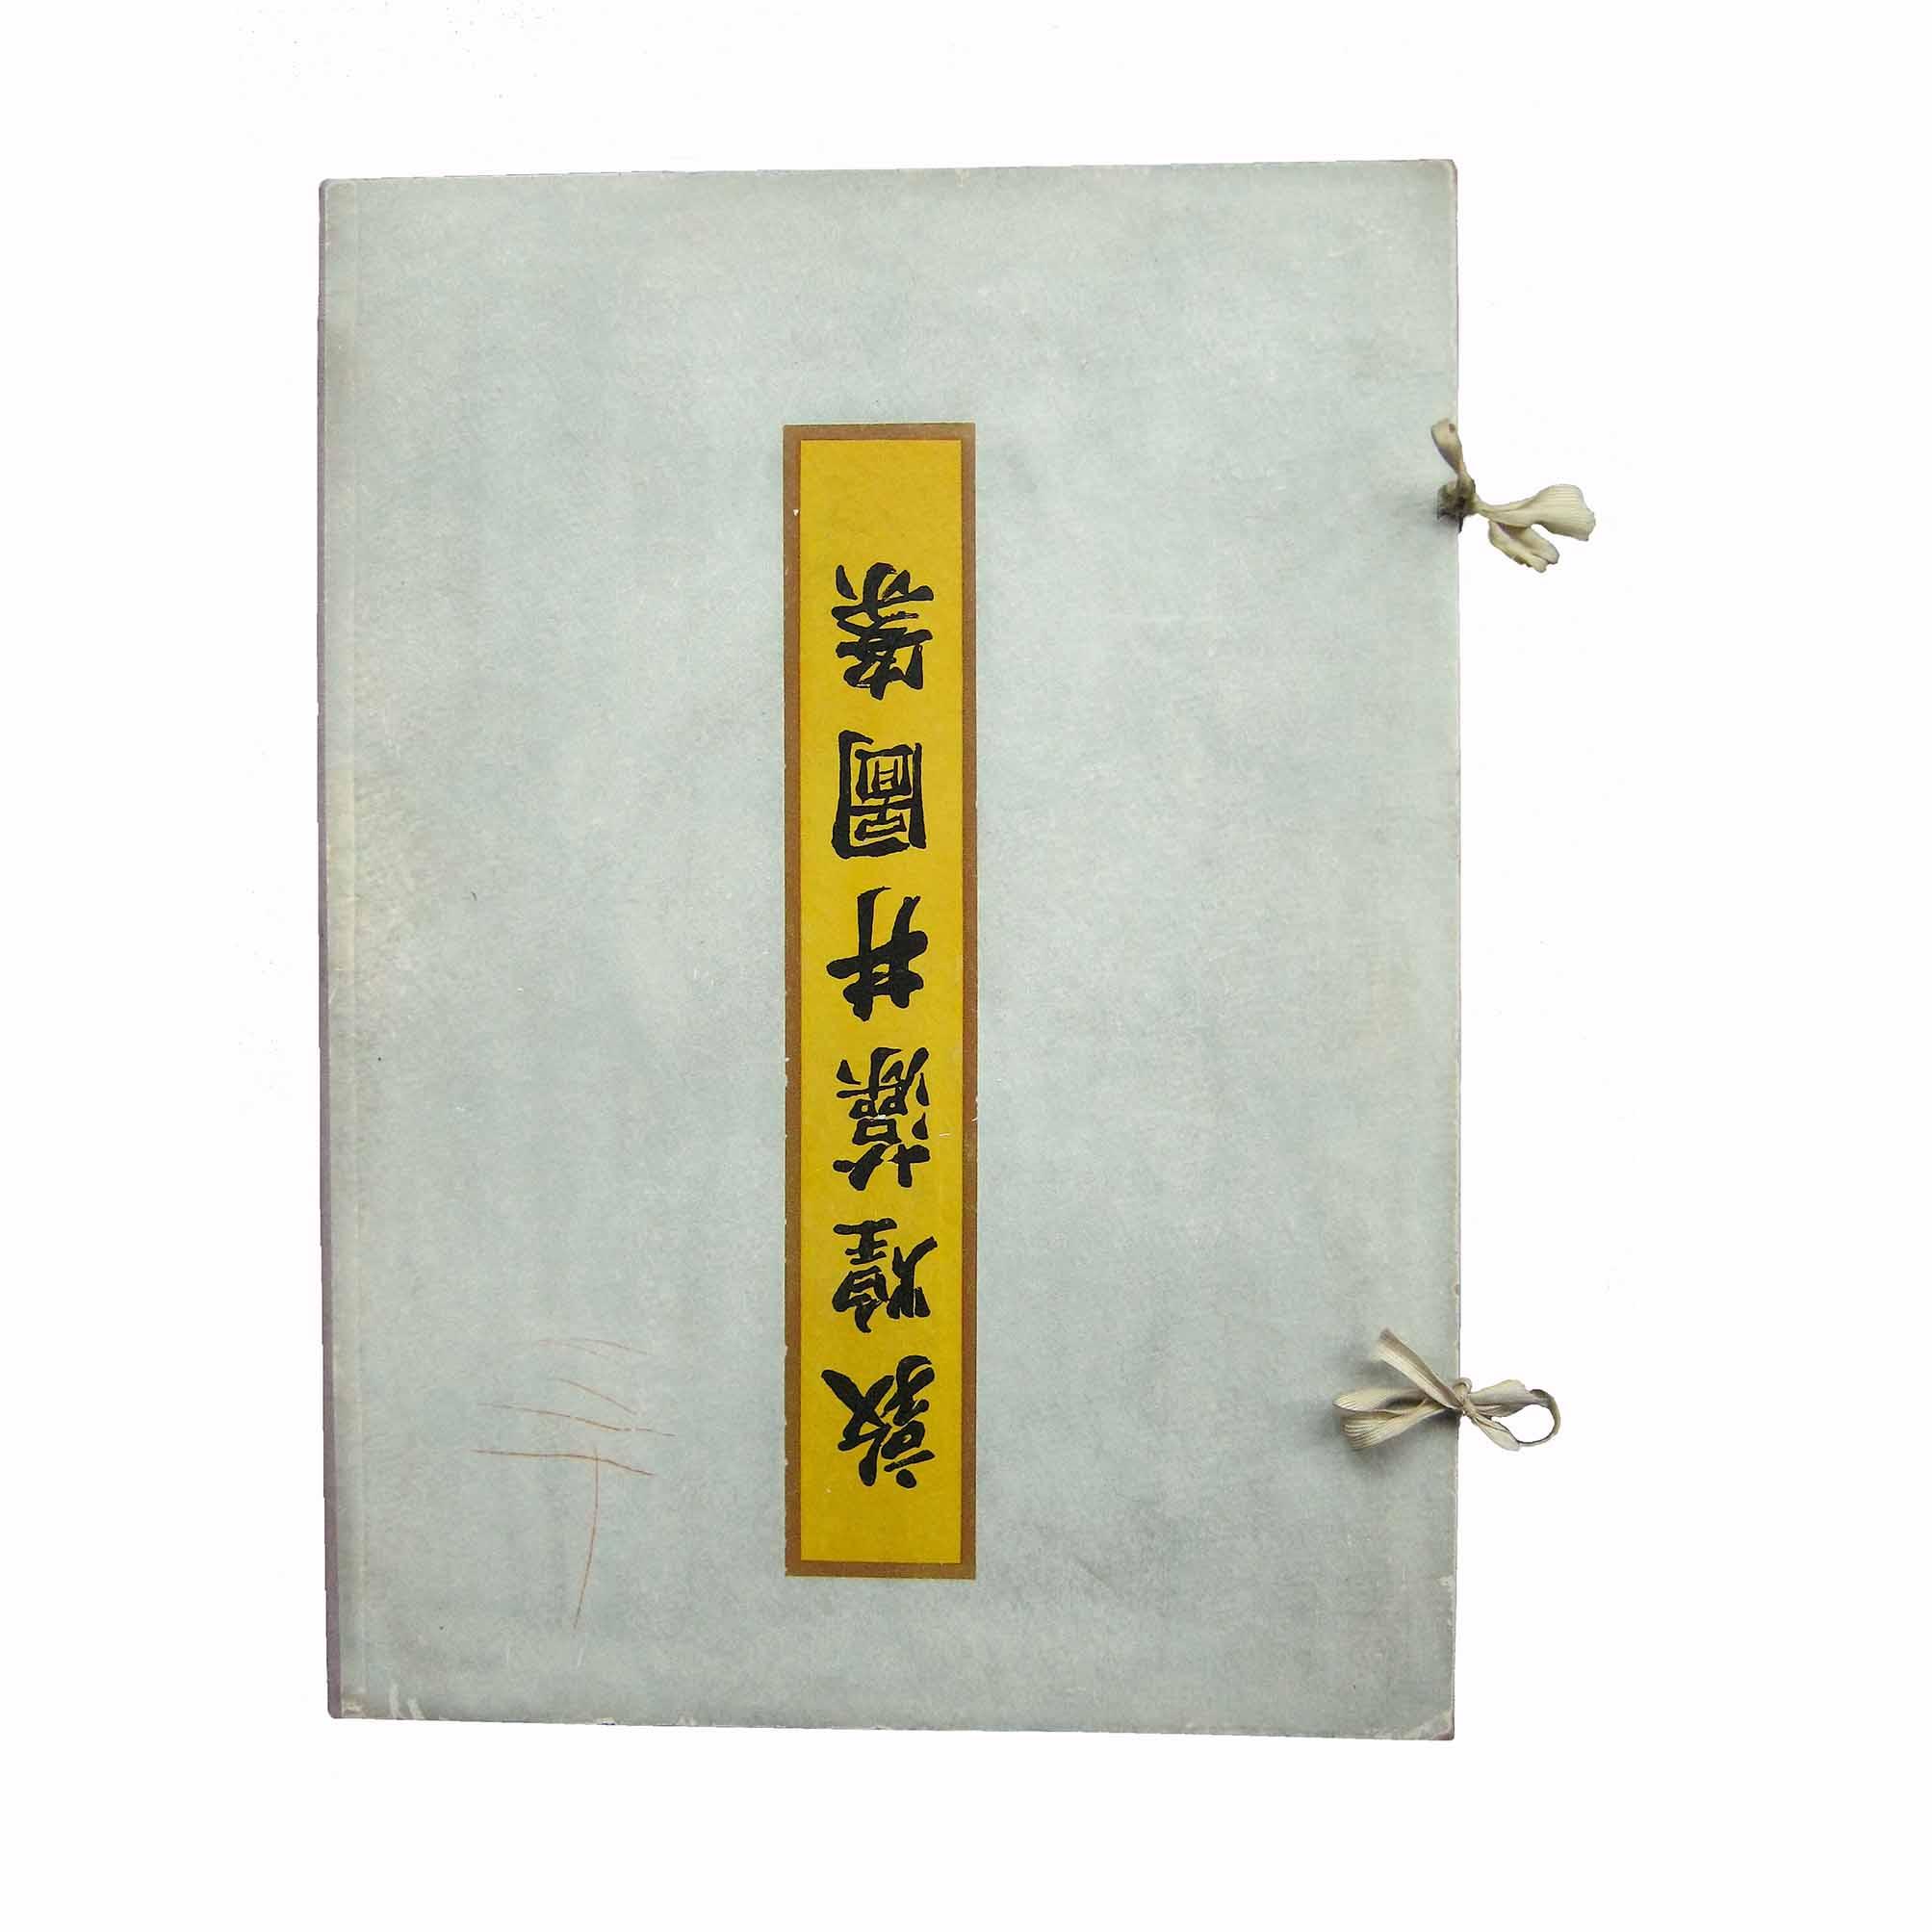 5635-China-Mogao-Caisson-1953-Album-frei-N-1.jpg